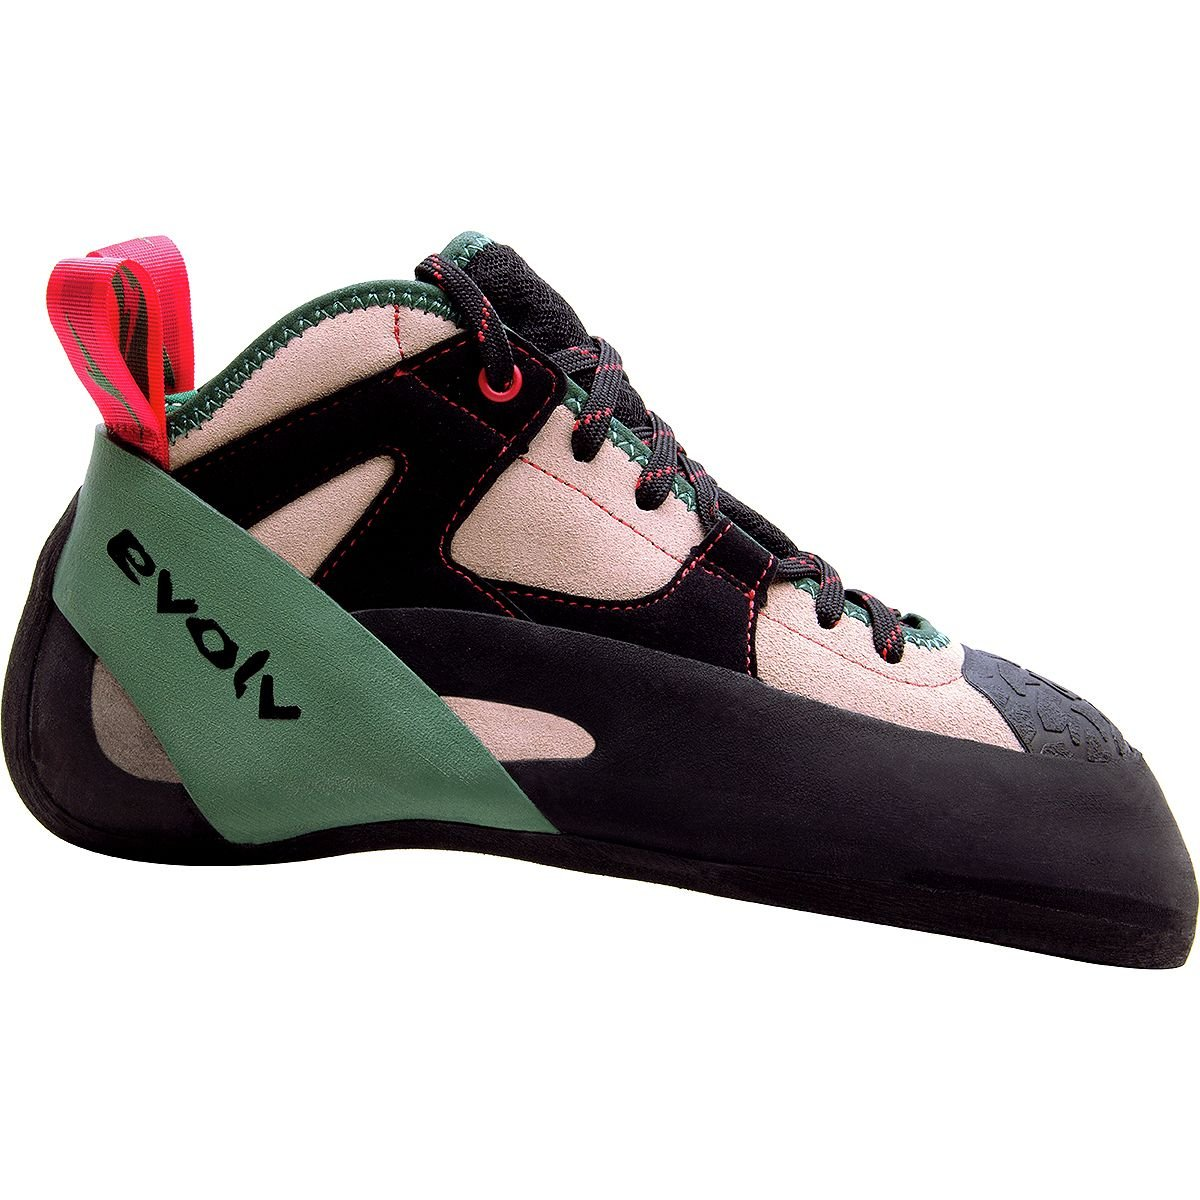 Скальные туфли Evolv General, tan/army green, 10.5